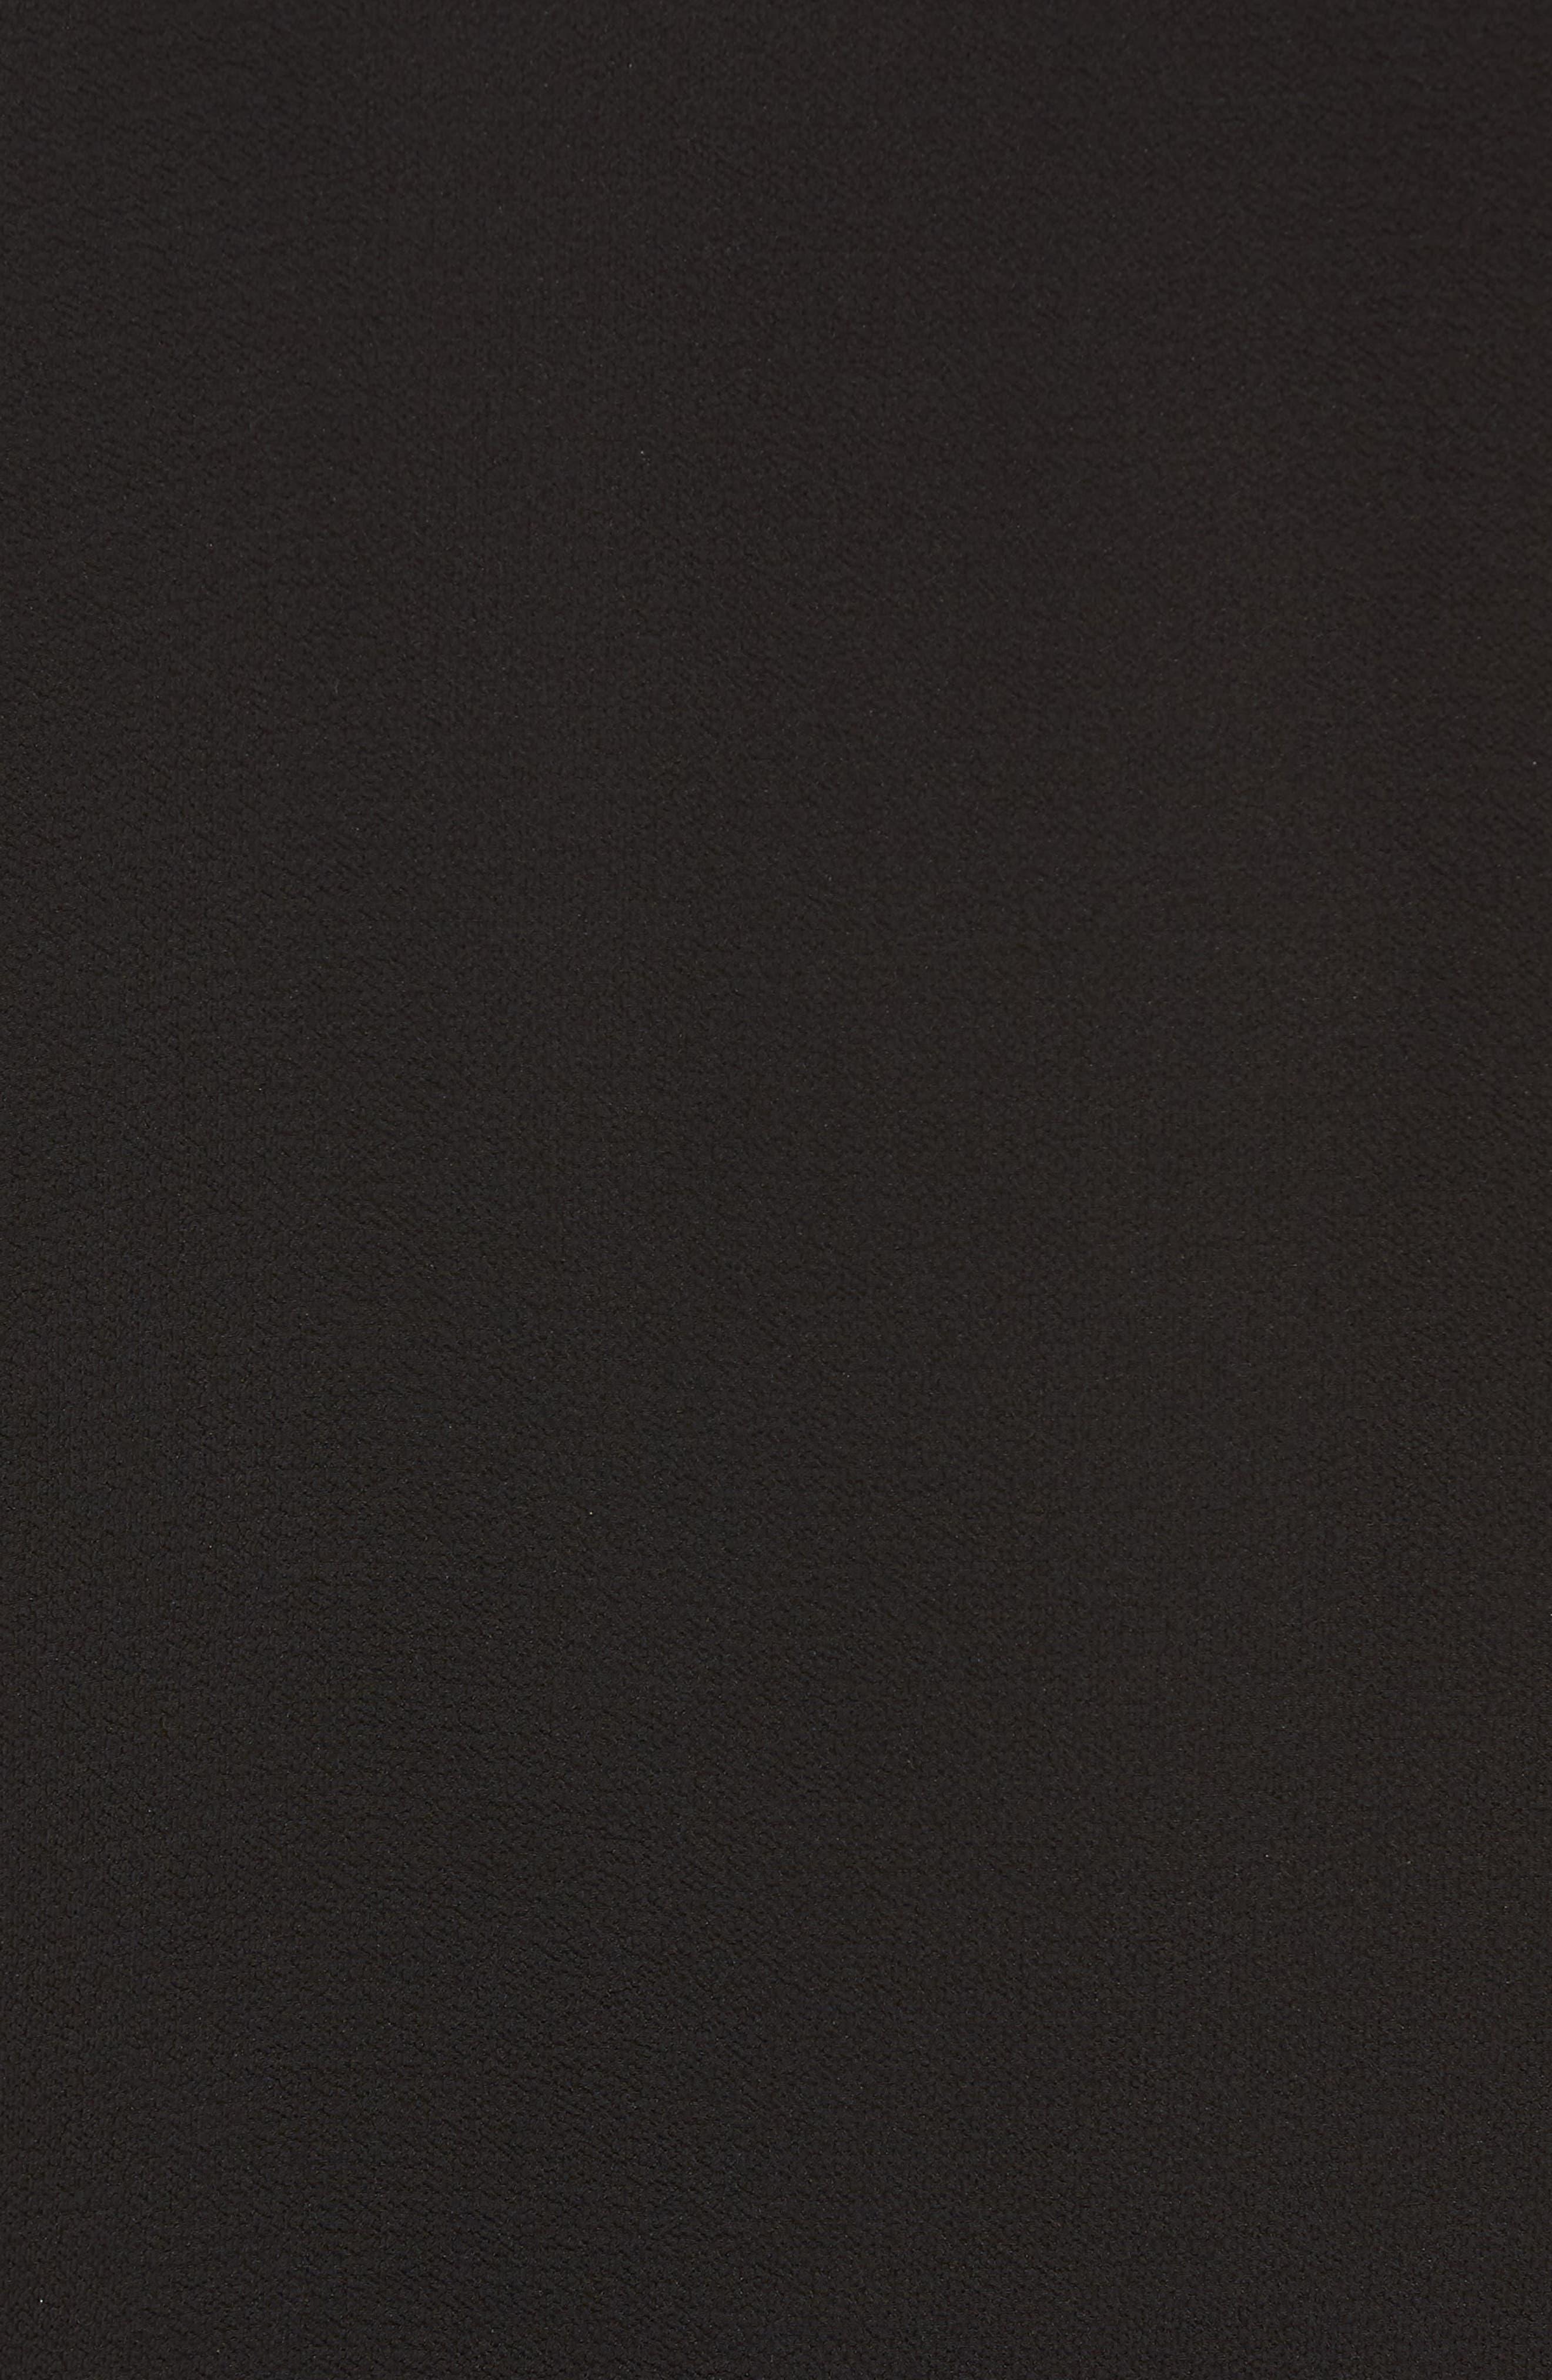 Sequin Ruffle Top,                             Alternate thumbnail 5, color,                             BLACK